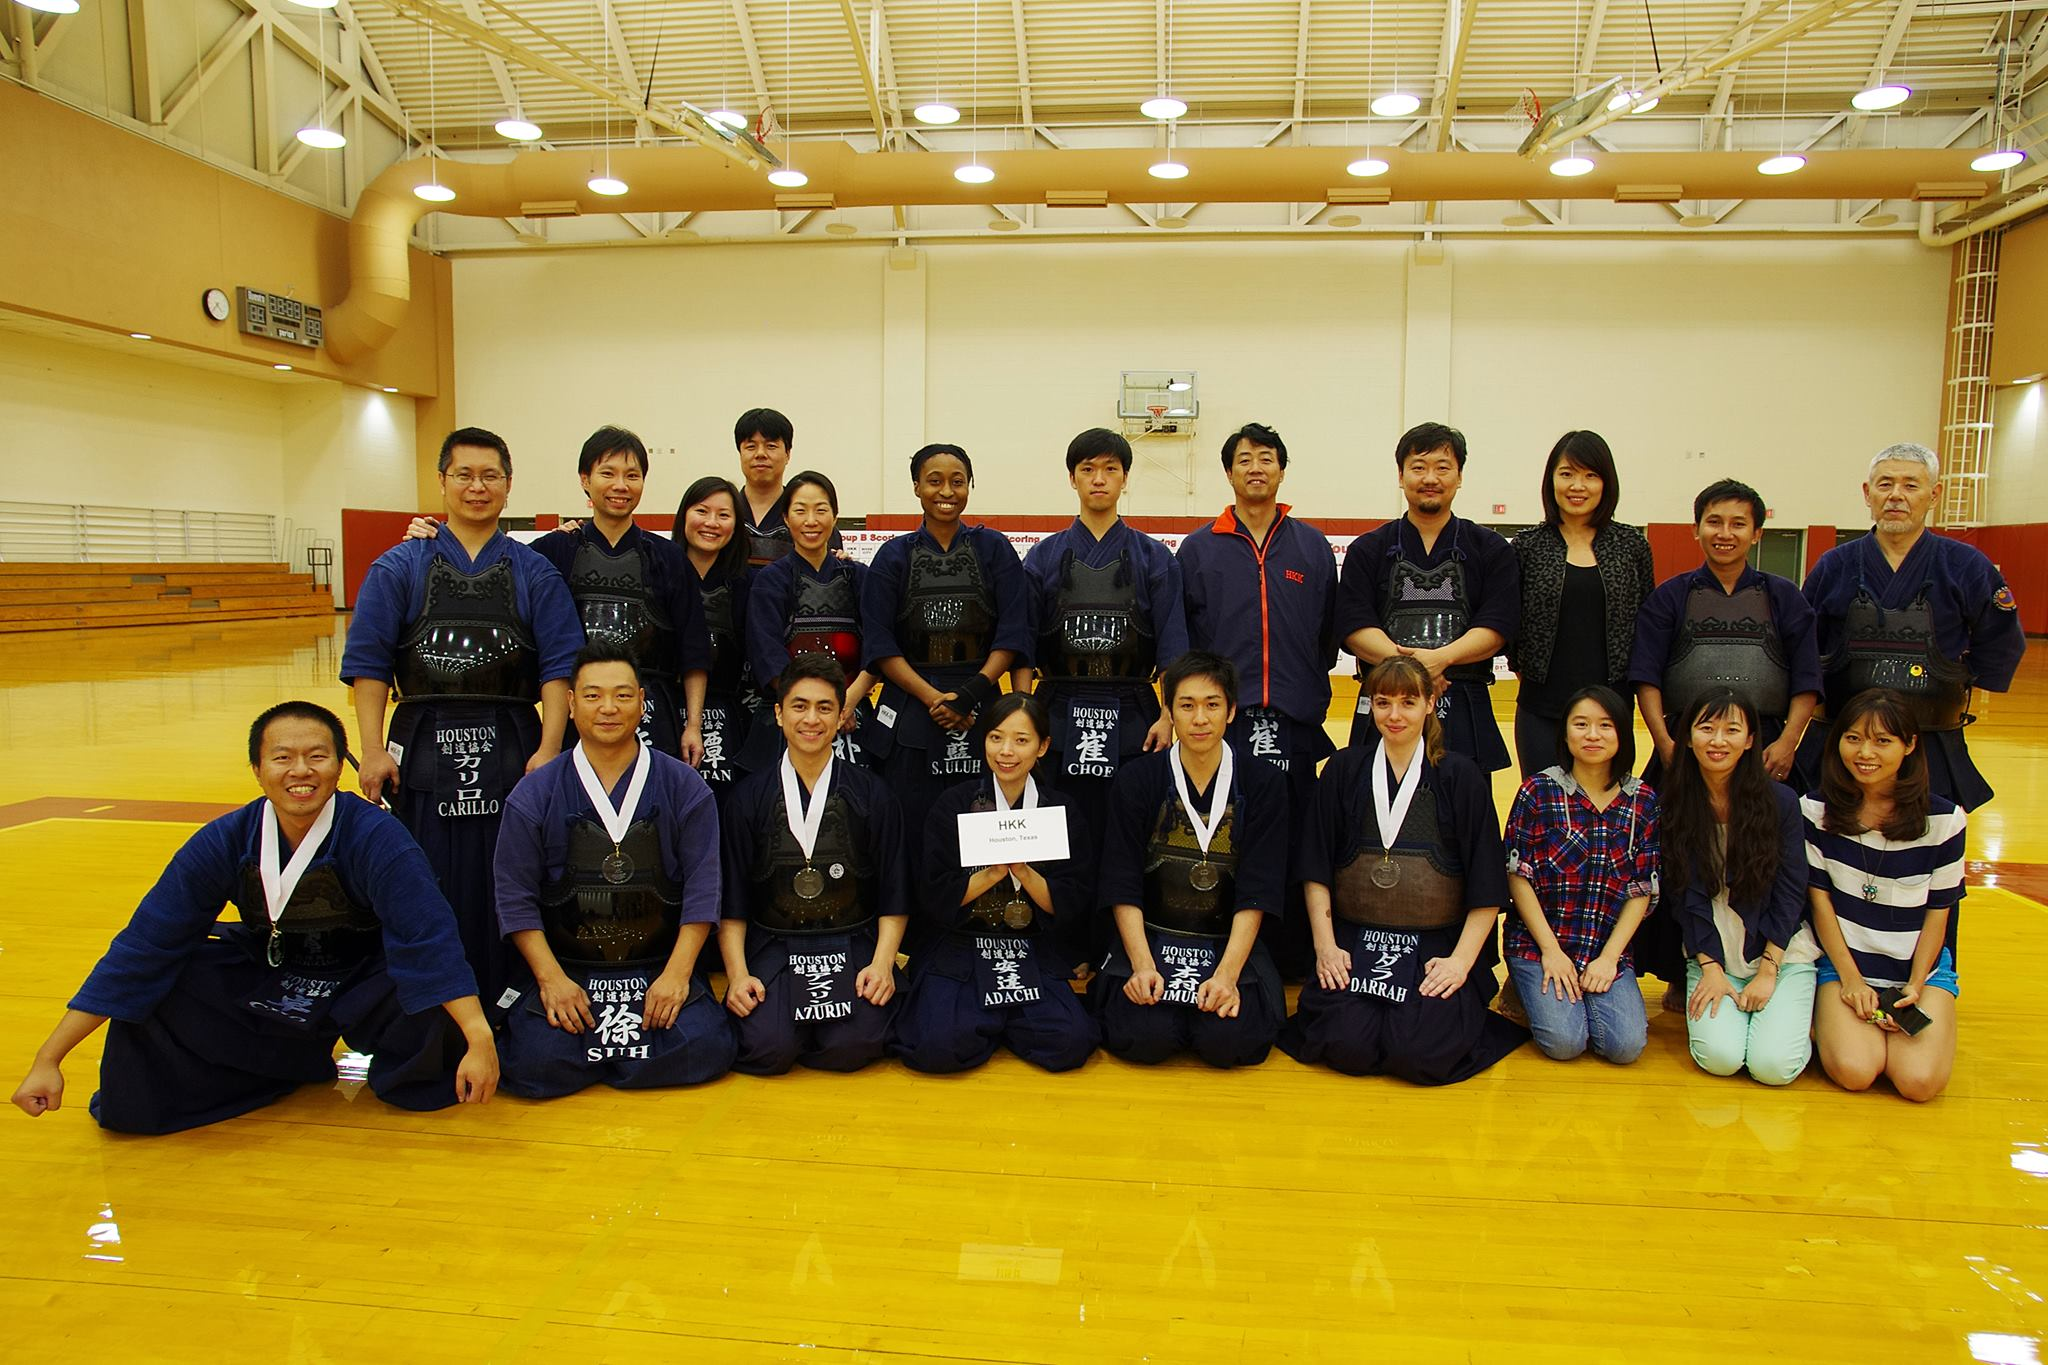 HKK members - 3rd place in 2015 Longhorn Invitational Kendo Team Taikai - Austin, TX